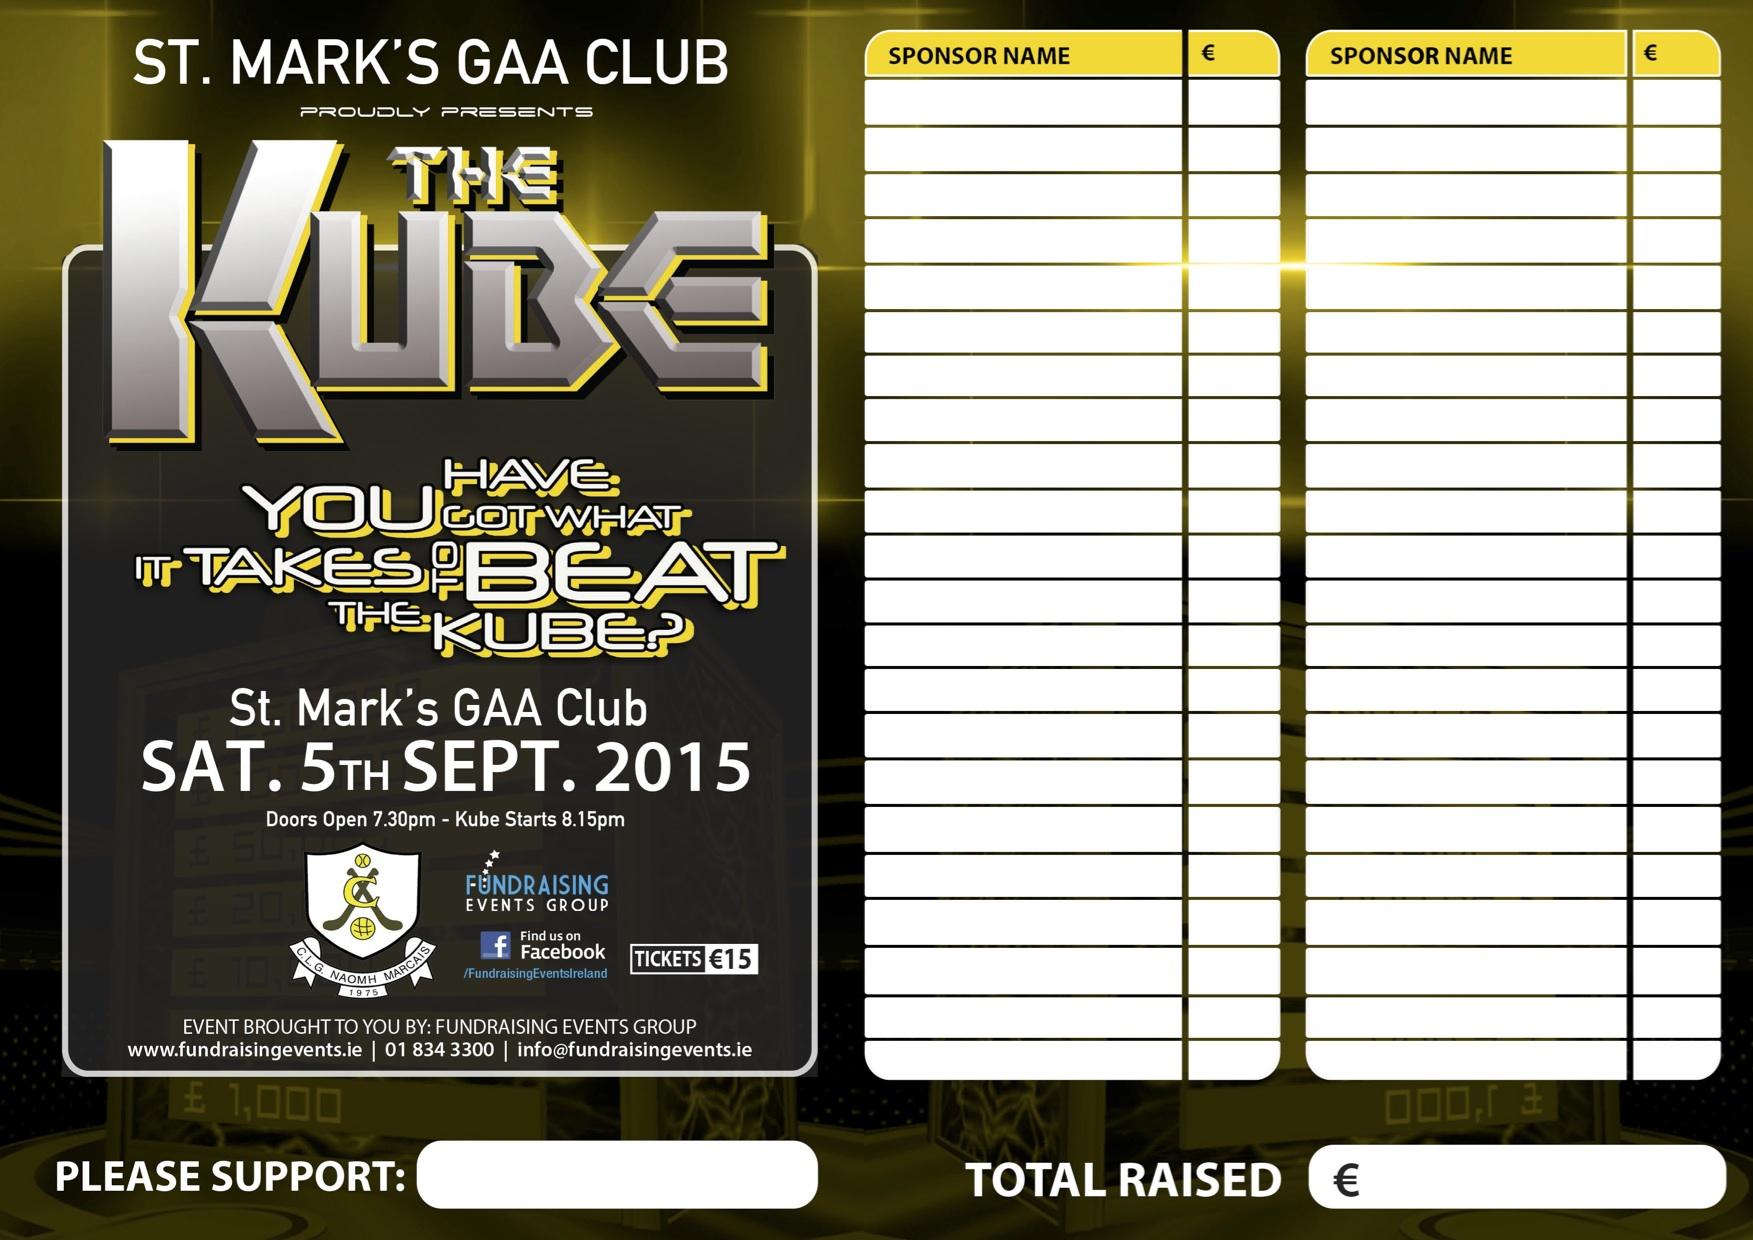 St Marks GAA Club Tallaght The Kube Fundraiser The Kube